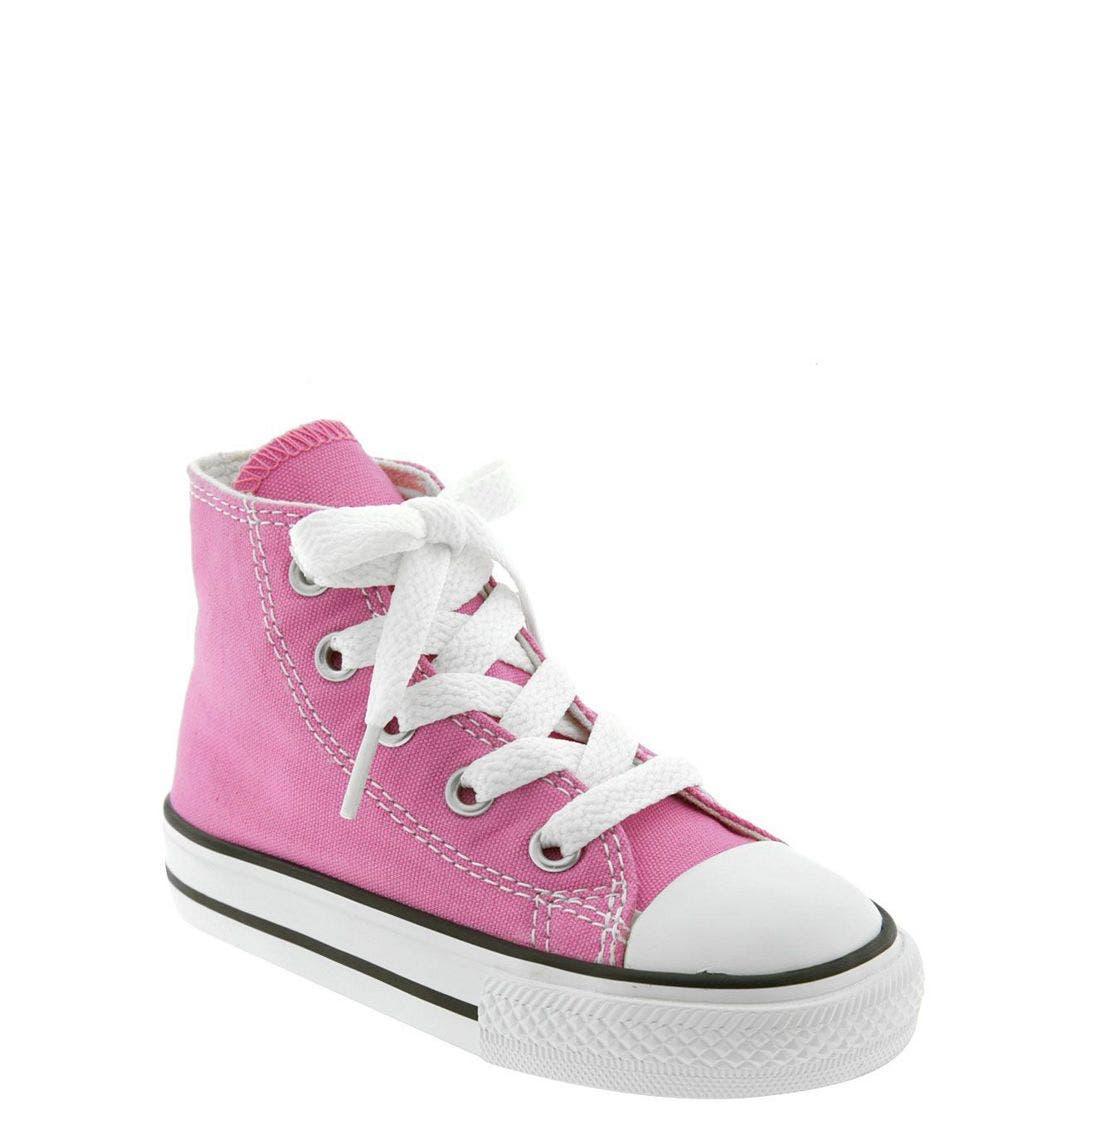 Converse All Star® High Top Sneaker (Baby, Walker & Toddler)